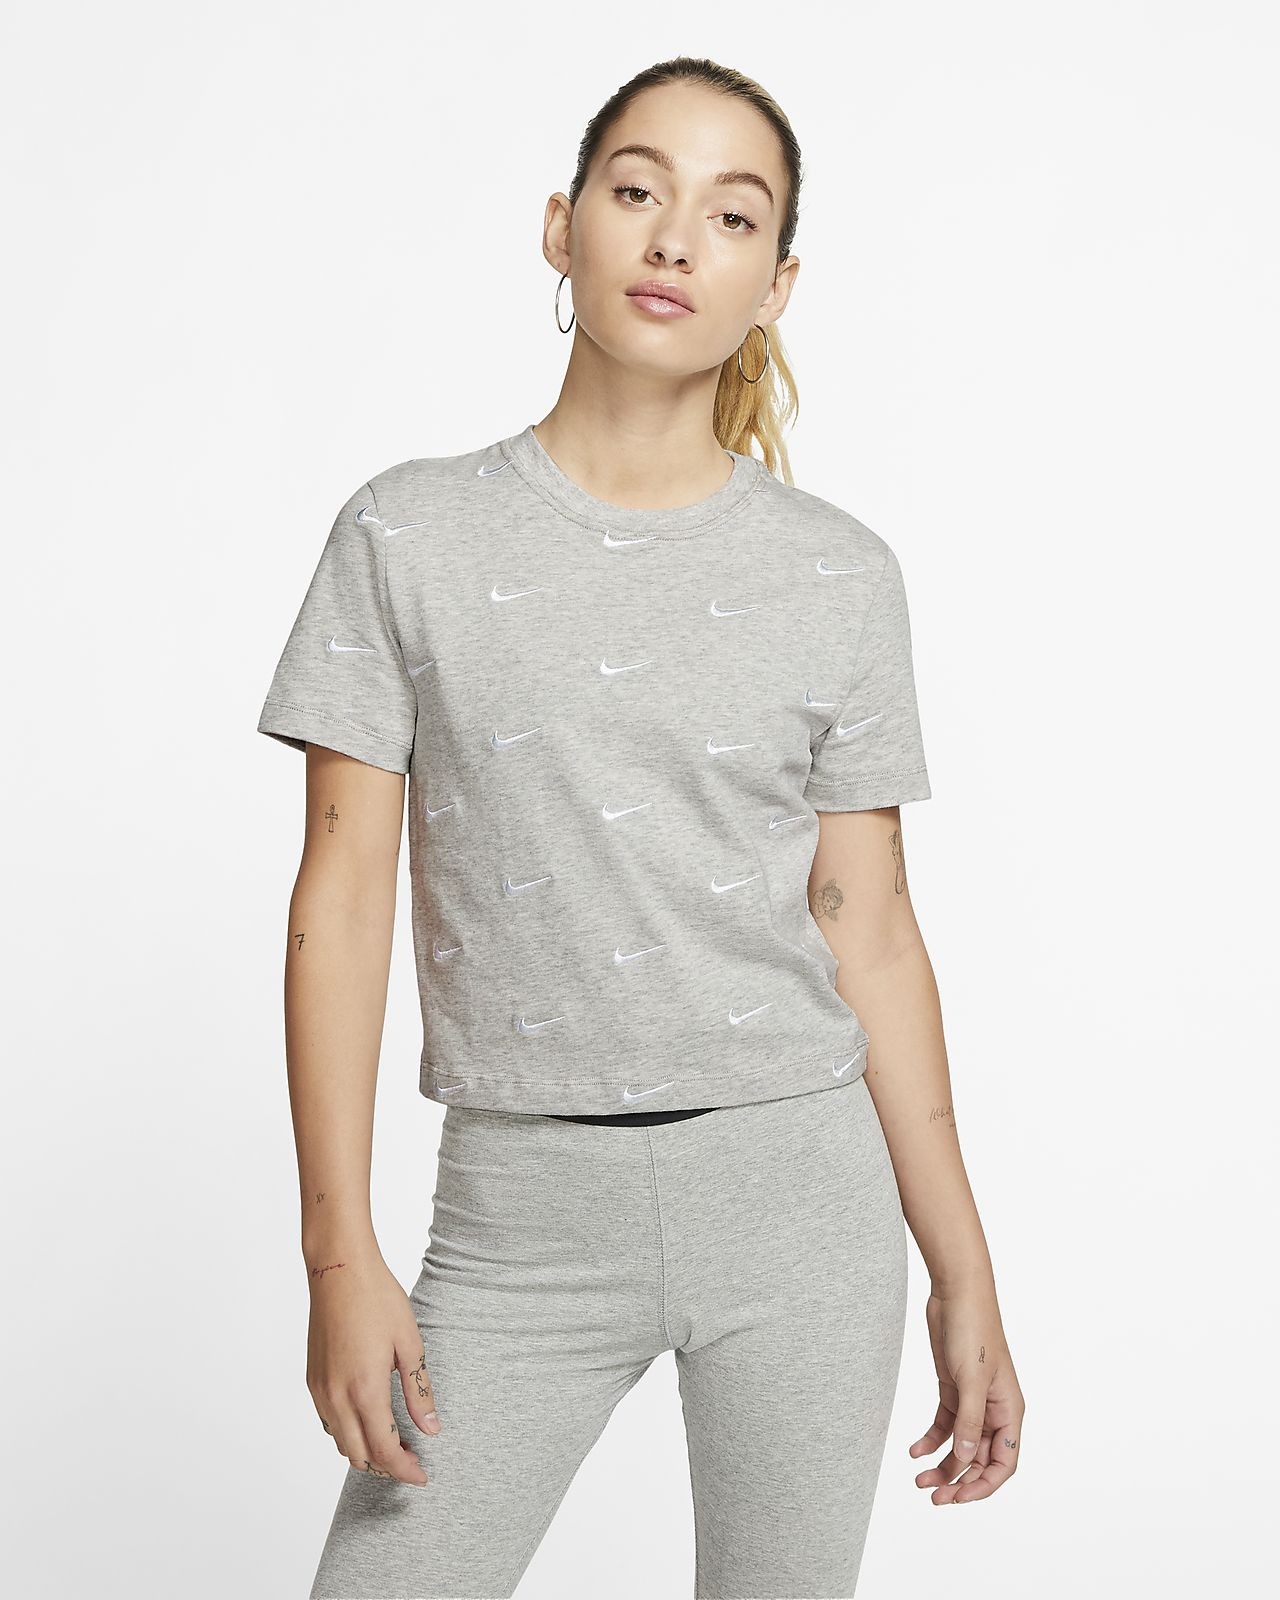 Tee-shirt à logo Swoosh Nike pour Femme